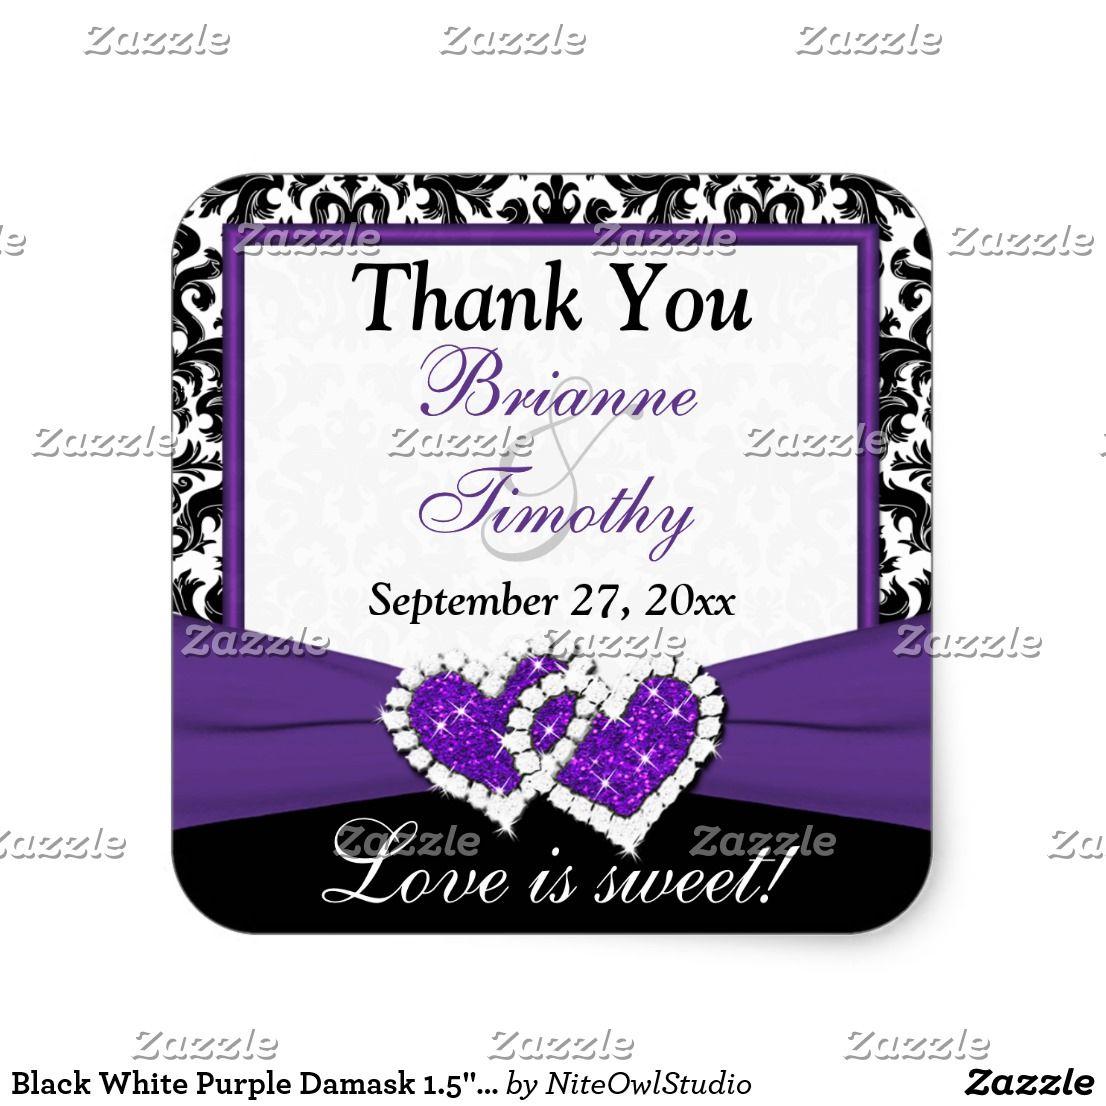 Black White Purple Damask 1.5\